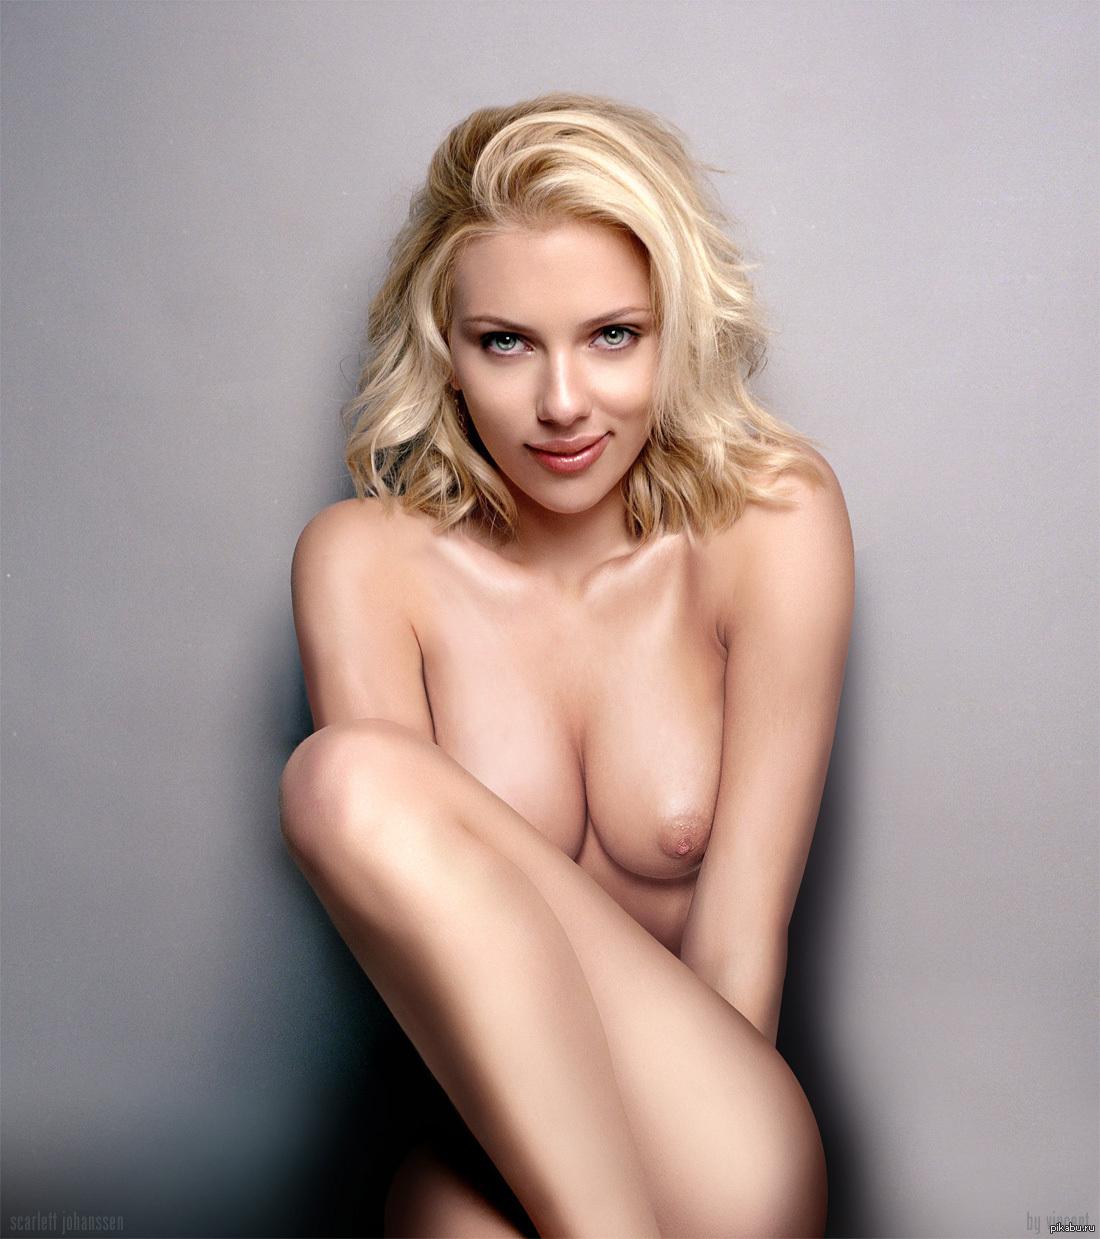 women-scarlett-johansson-naked-movies-butch